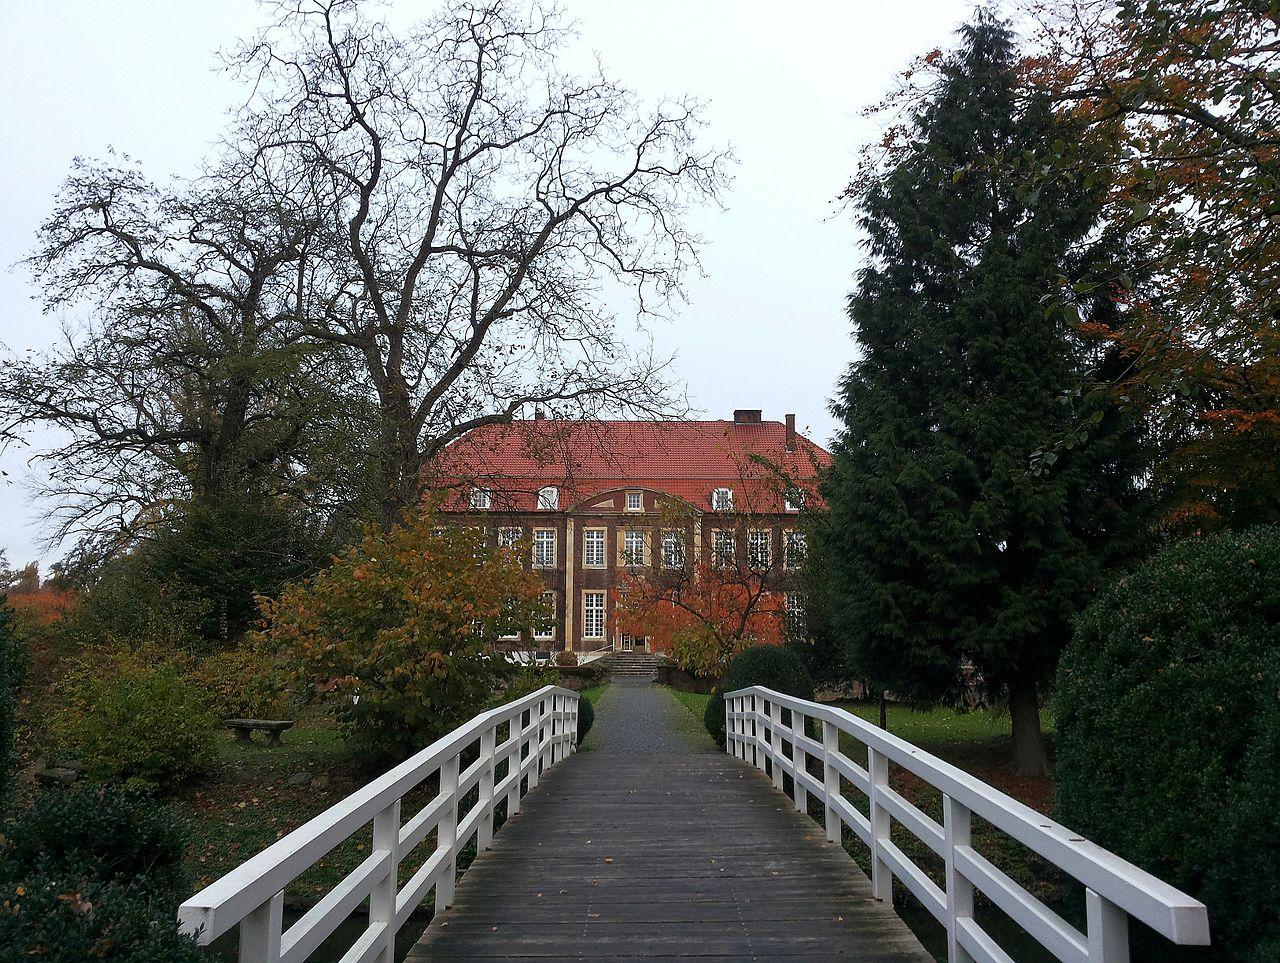 Bild Schloss Wilkinghege Münster